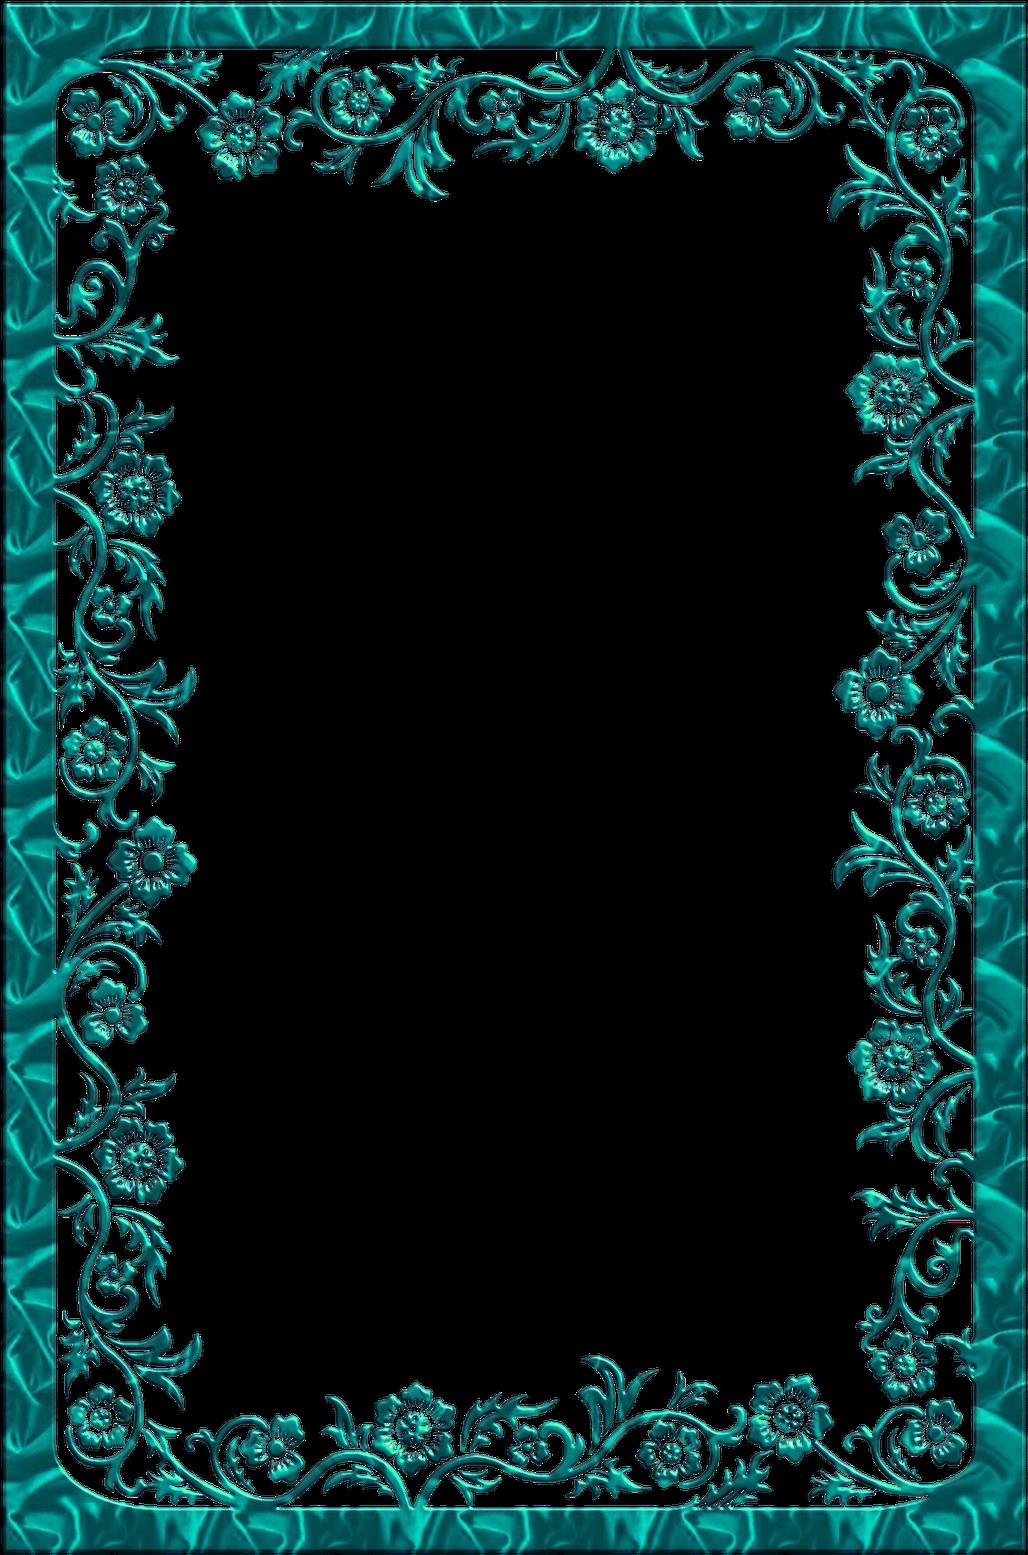 Arabesco Moldura Azul Png Clipart Full Size Clipart 1265712